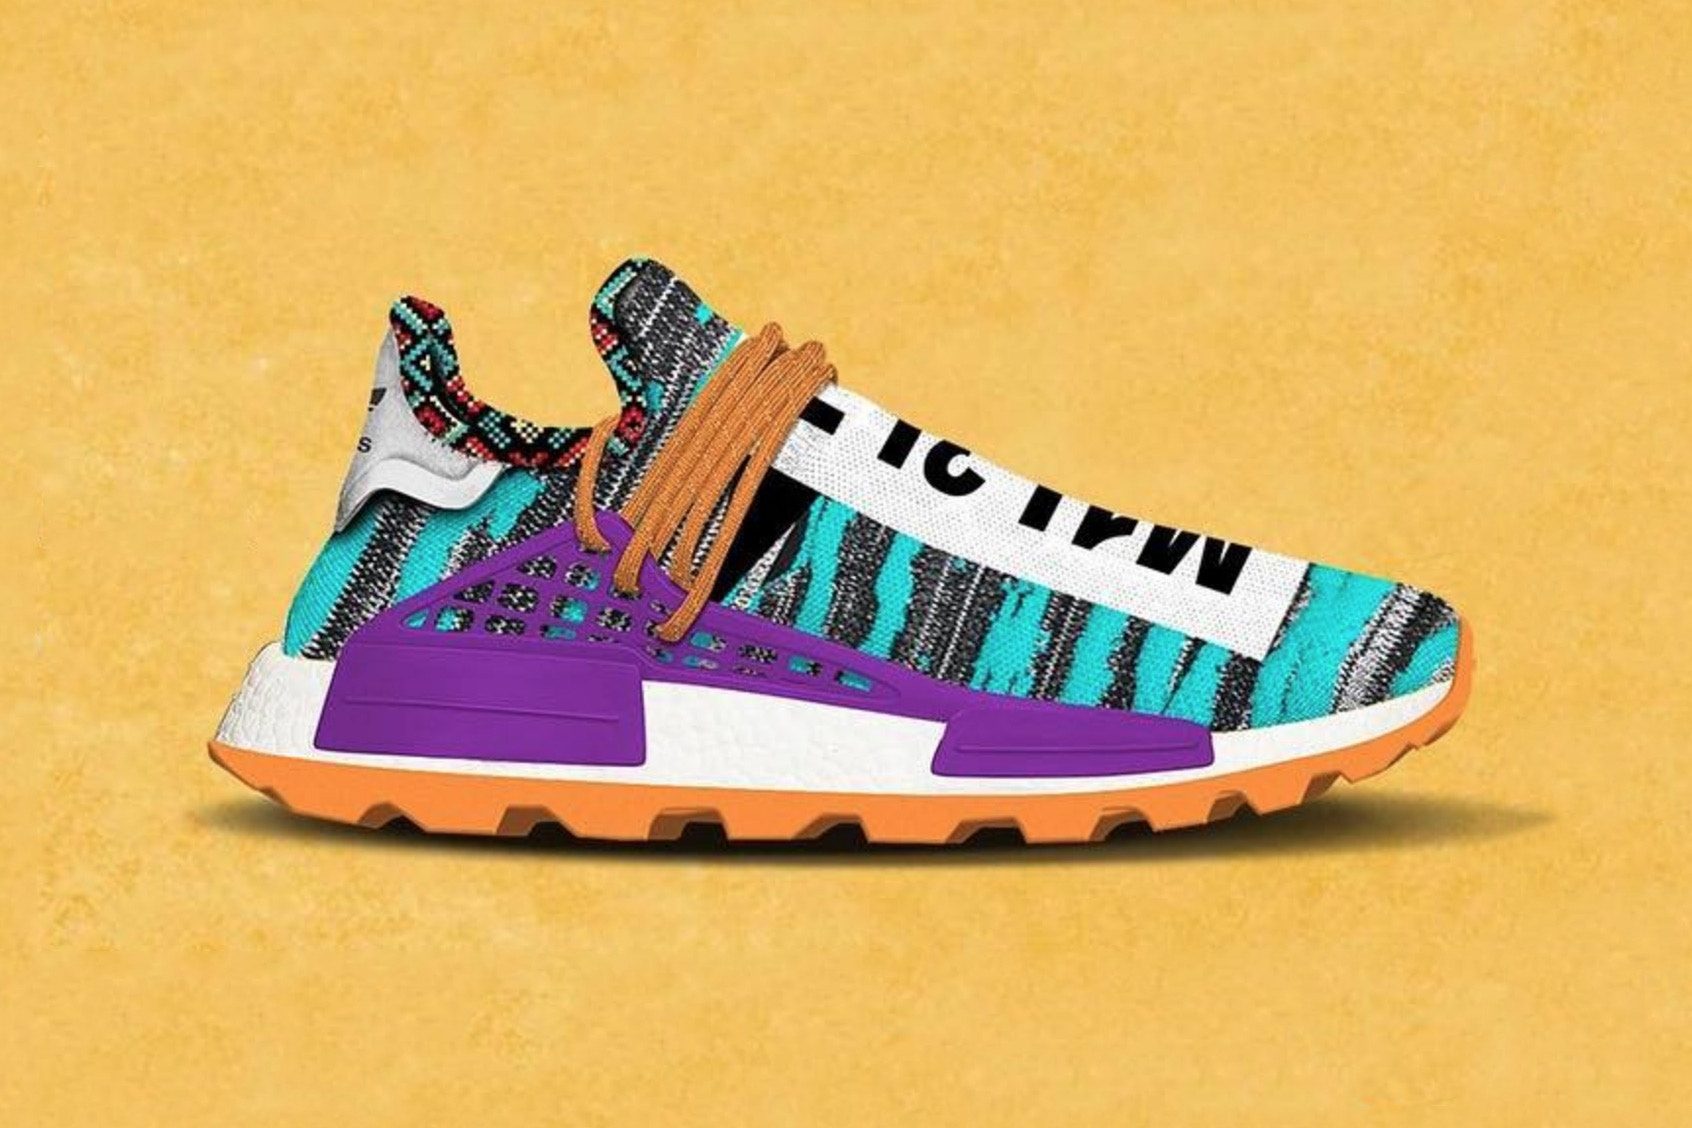 adidas-pharrell-afro-hu-nmd-02